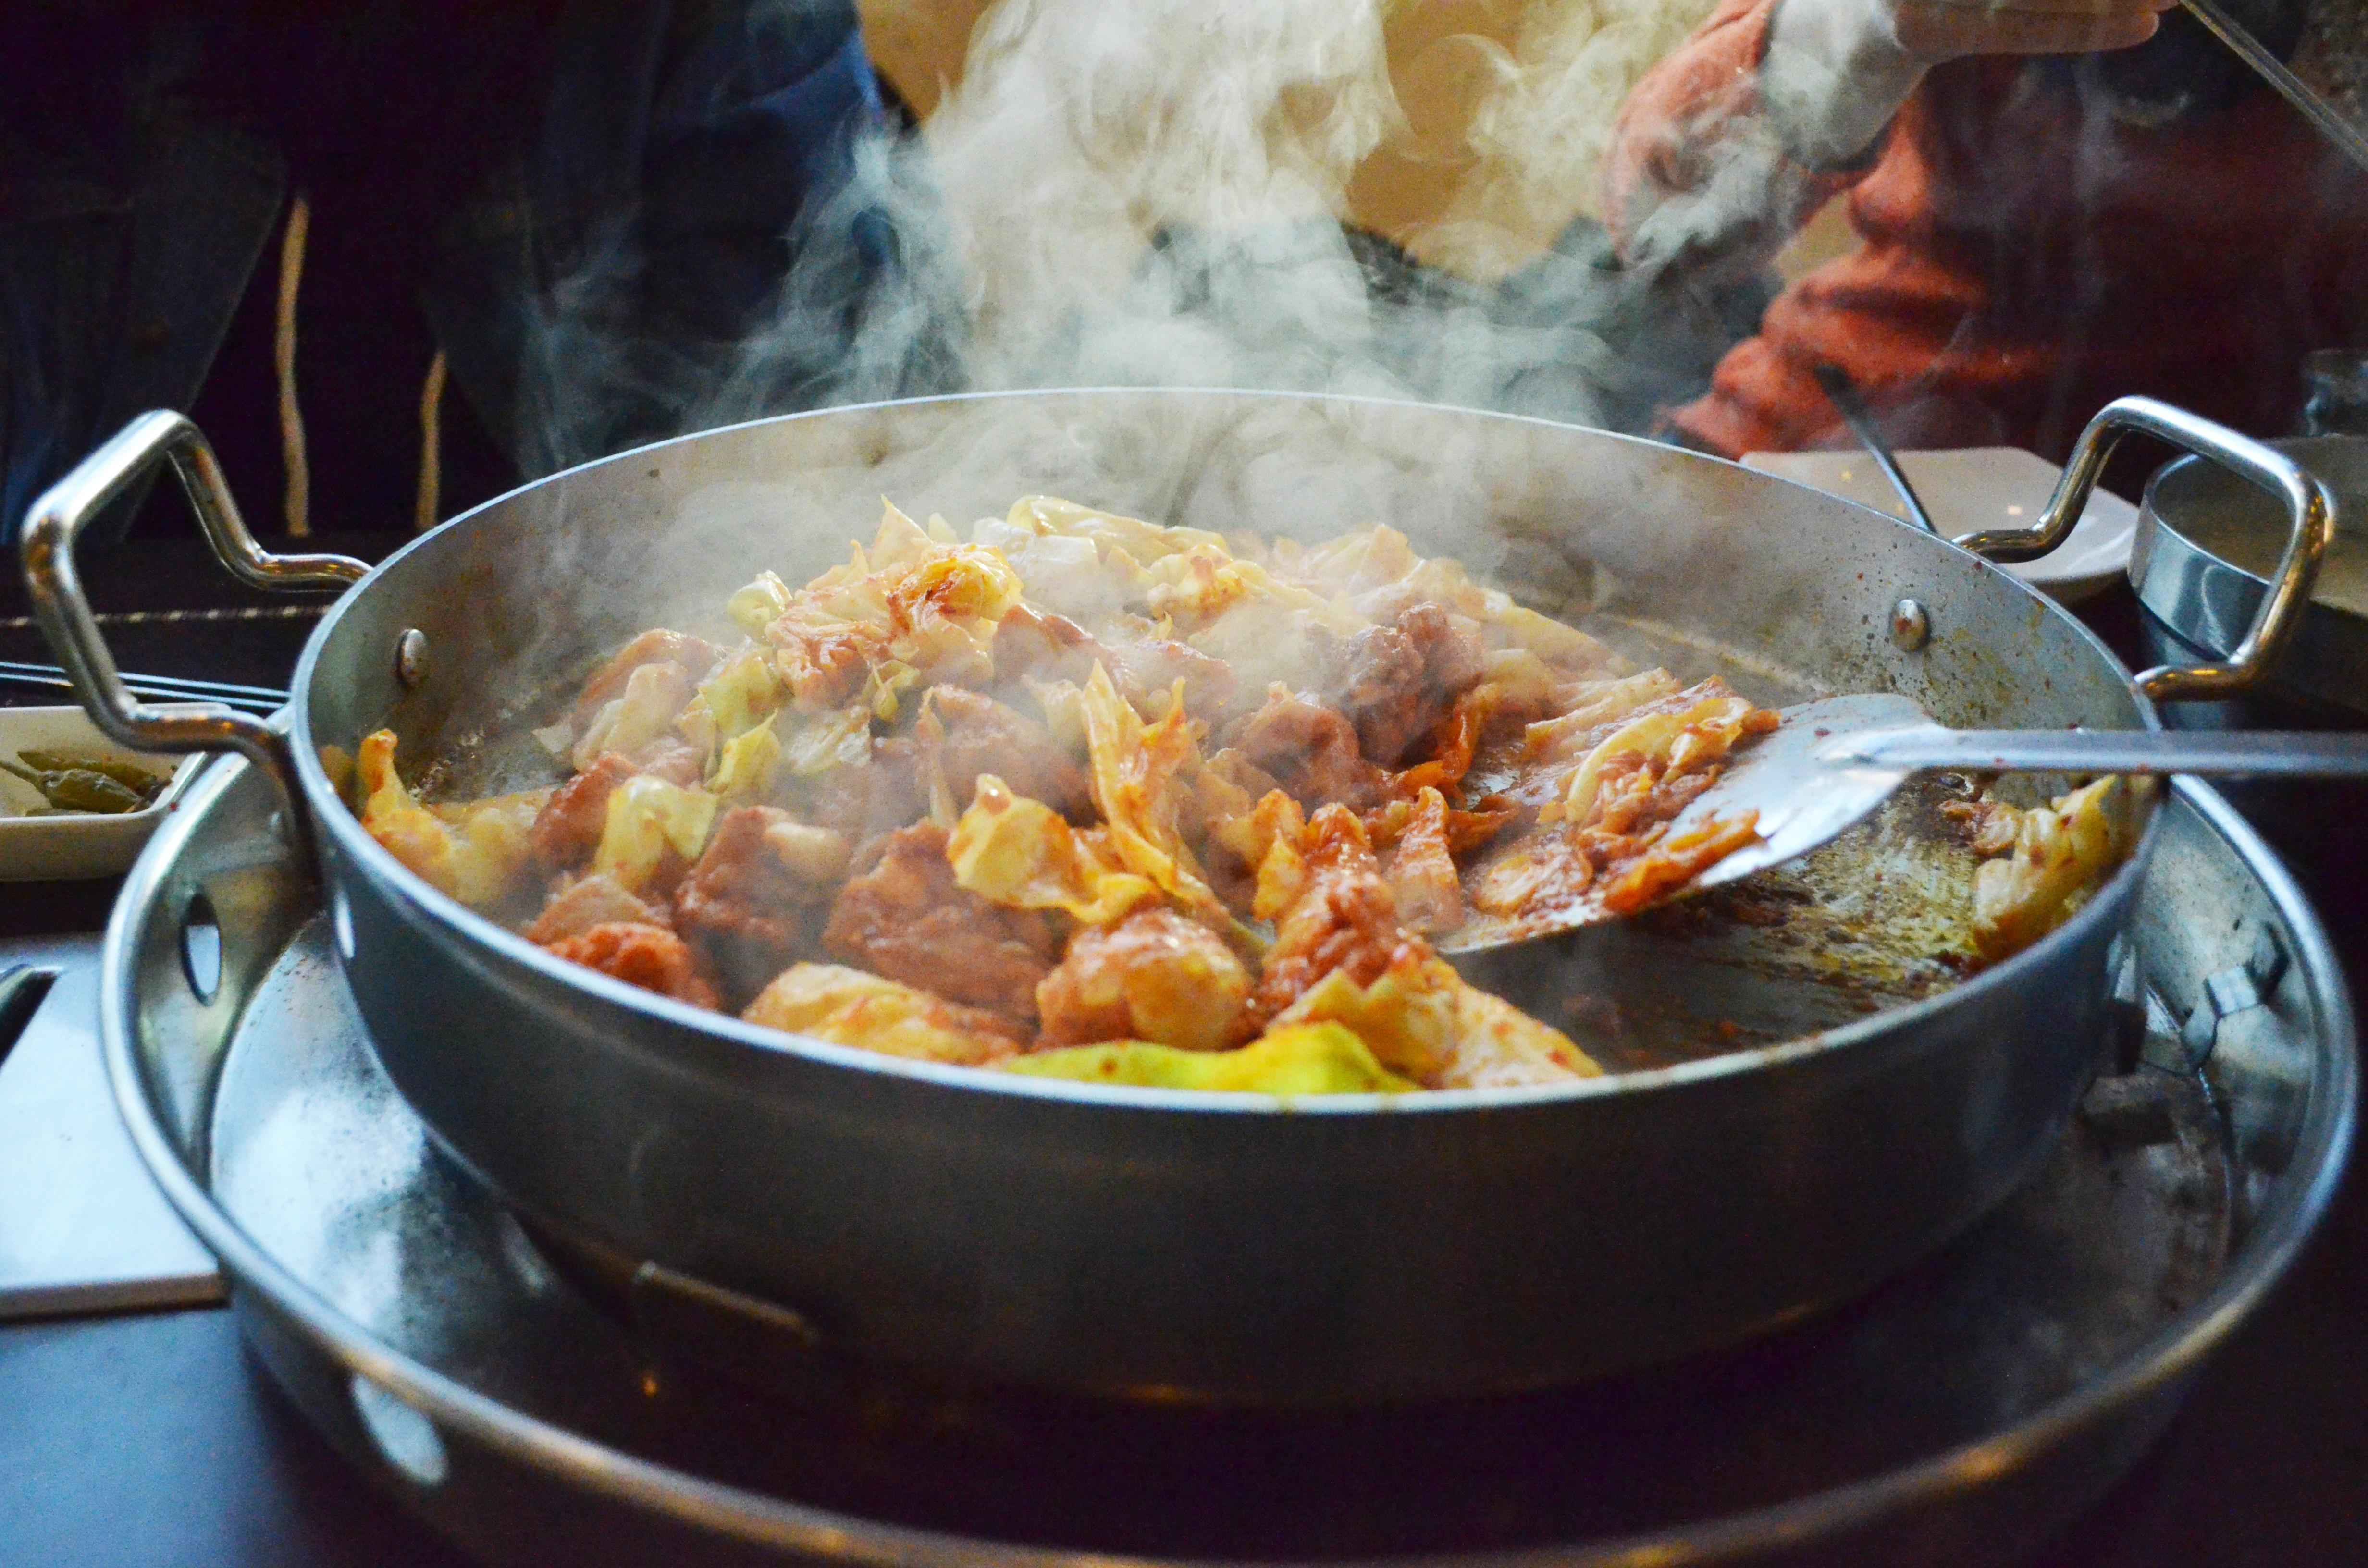 Fotos gratis : restaurante, plato, cocina, carne, delicioso, comida ...